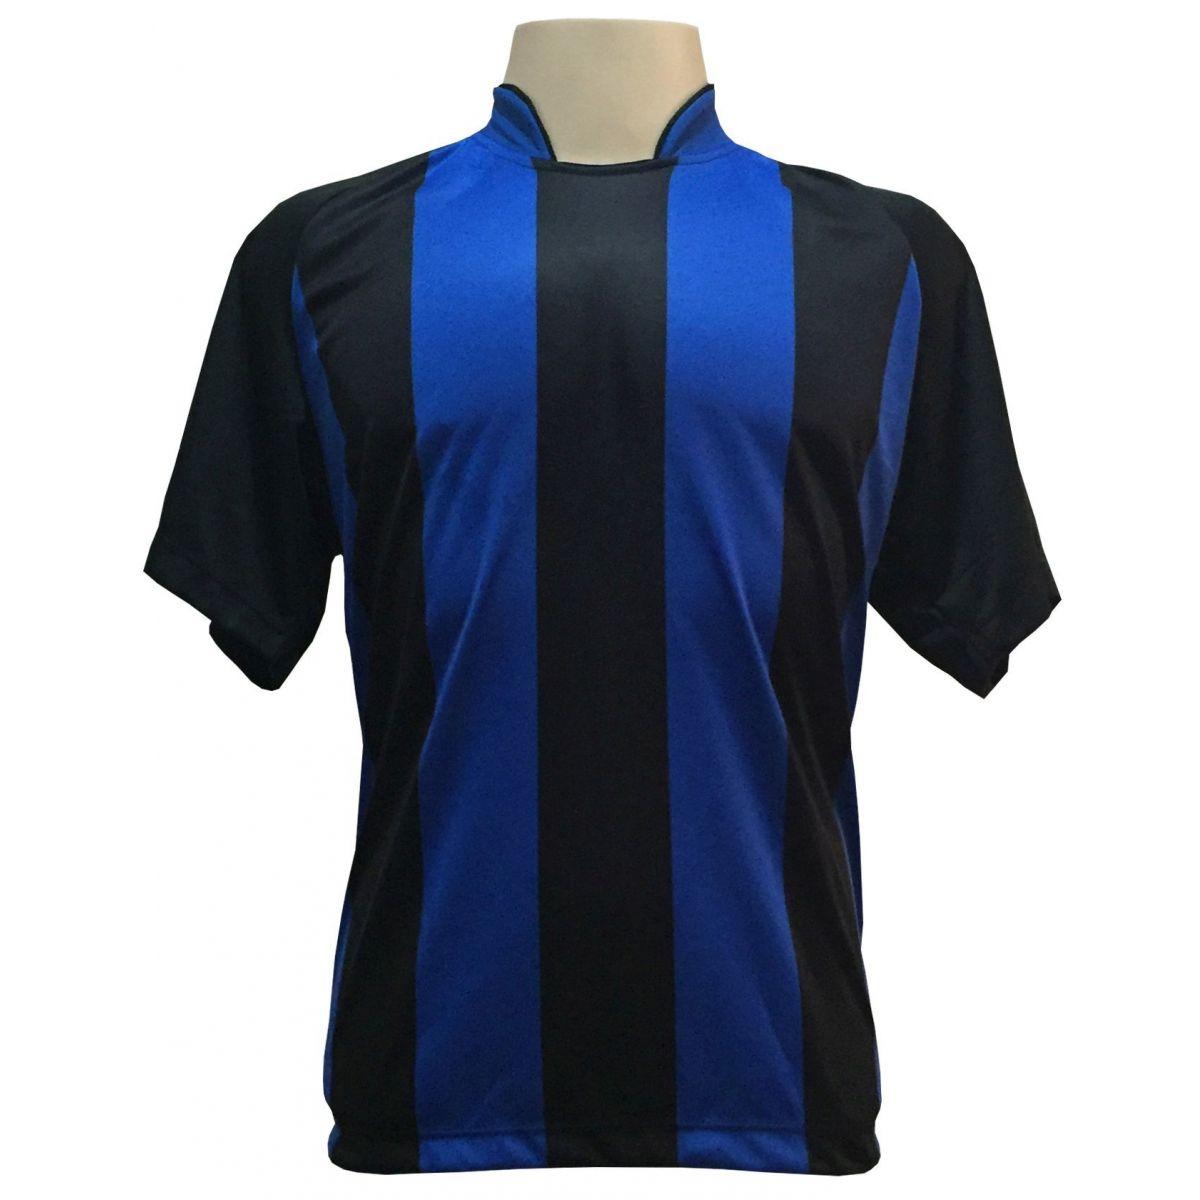 Jogo de Camisa modelo Milan Preto/Royal com 20 unidades - Frete Gr�tis Brasil + Brindes